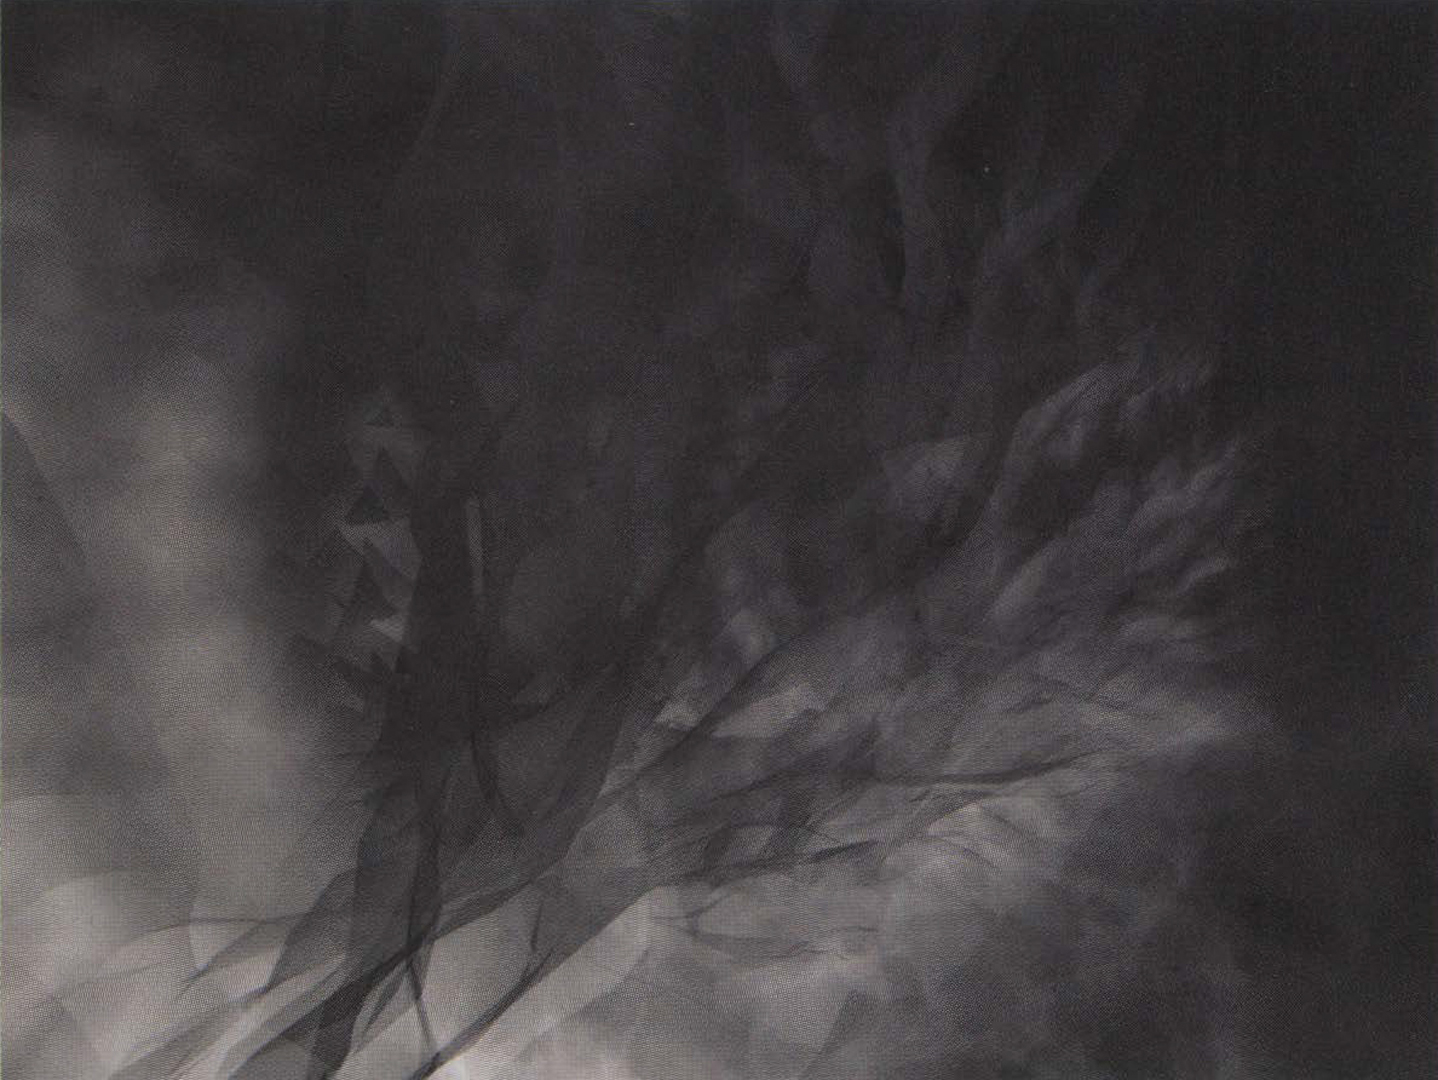 ©2004, Stephan Larson, (re)cognition